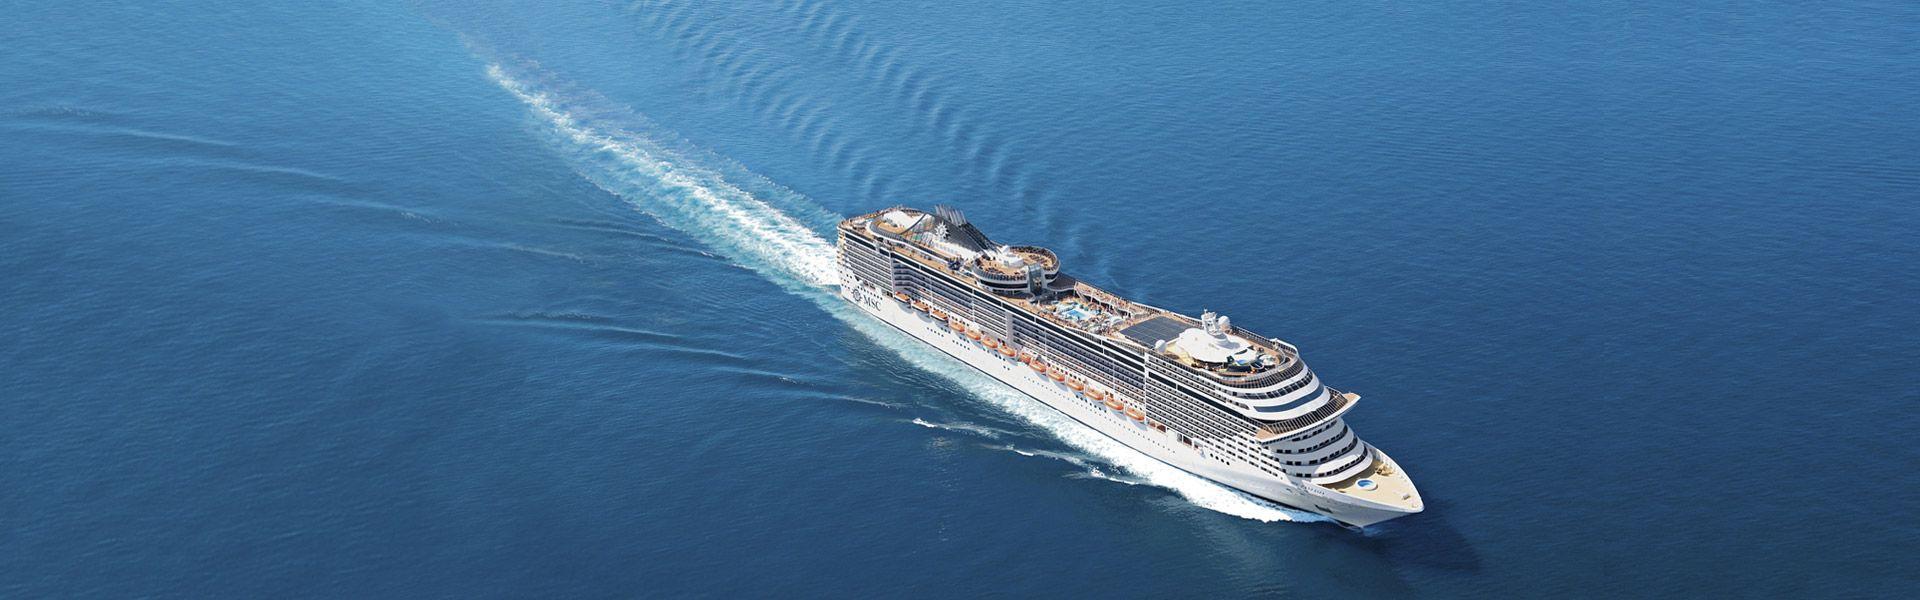 Croaziera 2016 - Mediterana de Vest (Genova) - MSC Cruises - MSC Splendida - 7 nopti - ZBOR INCLUS